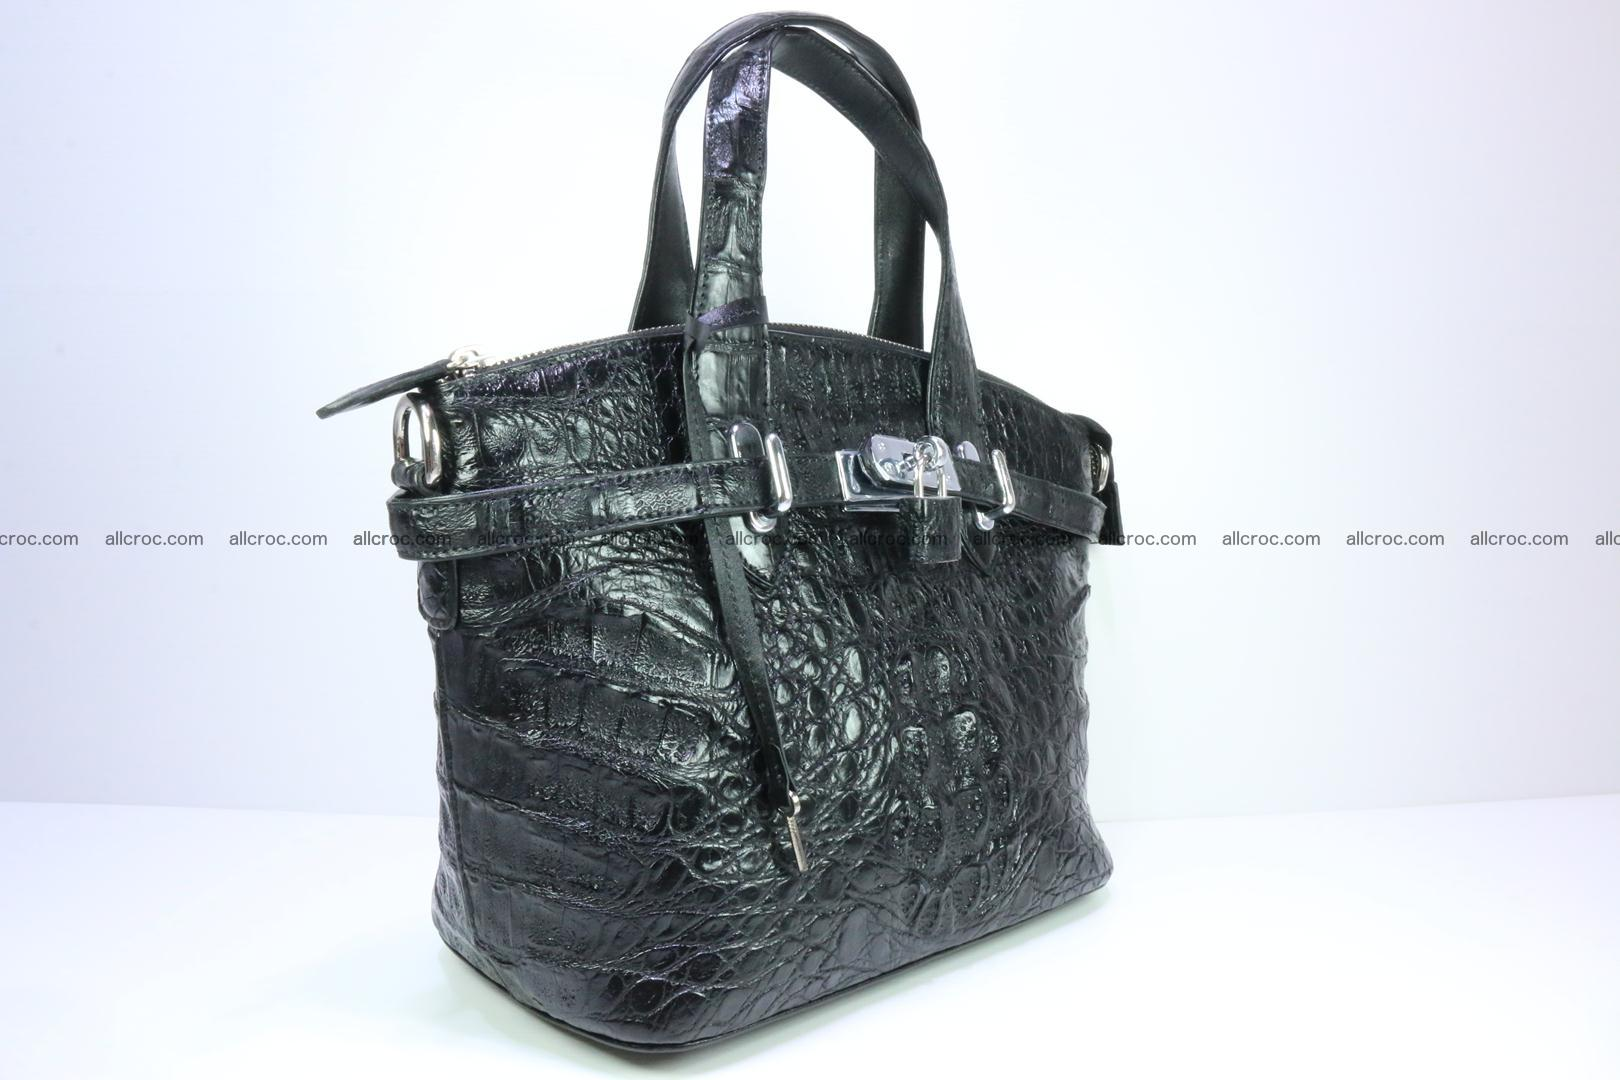 Genuine crocodile handbag for ladies 051 Foto 1